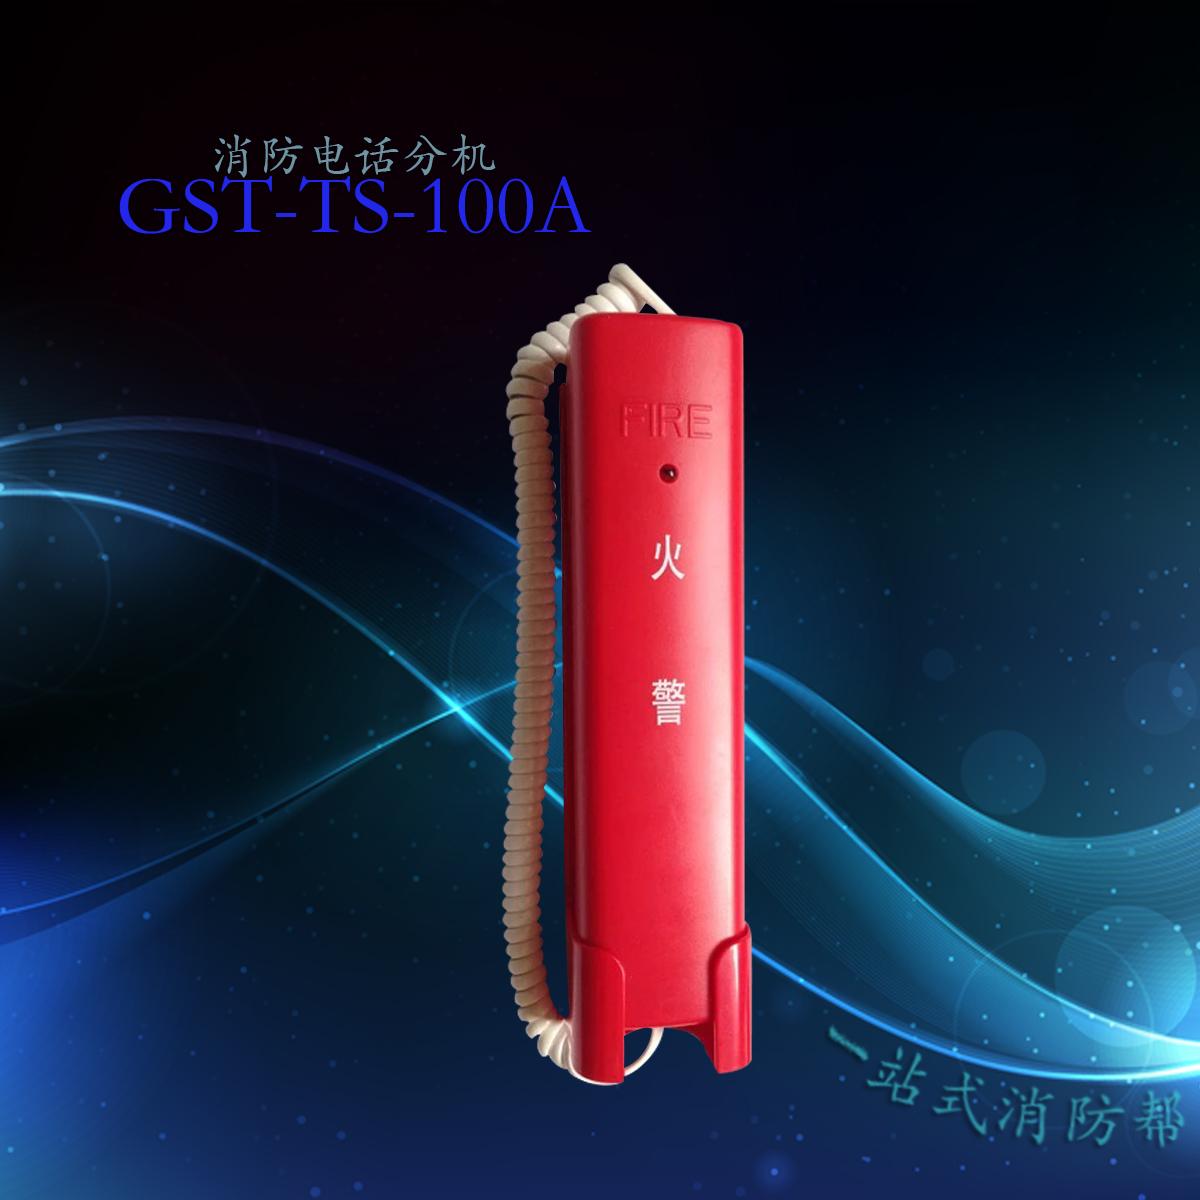 Море бухта GST-TS-100A пожаротушение телефон расширение